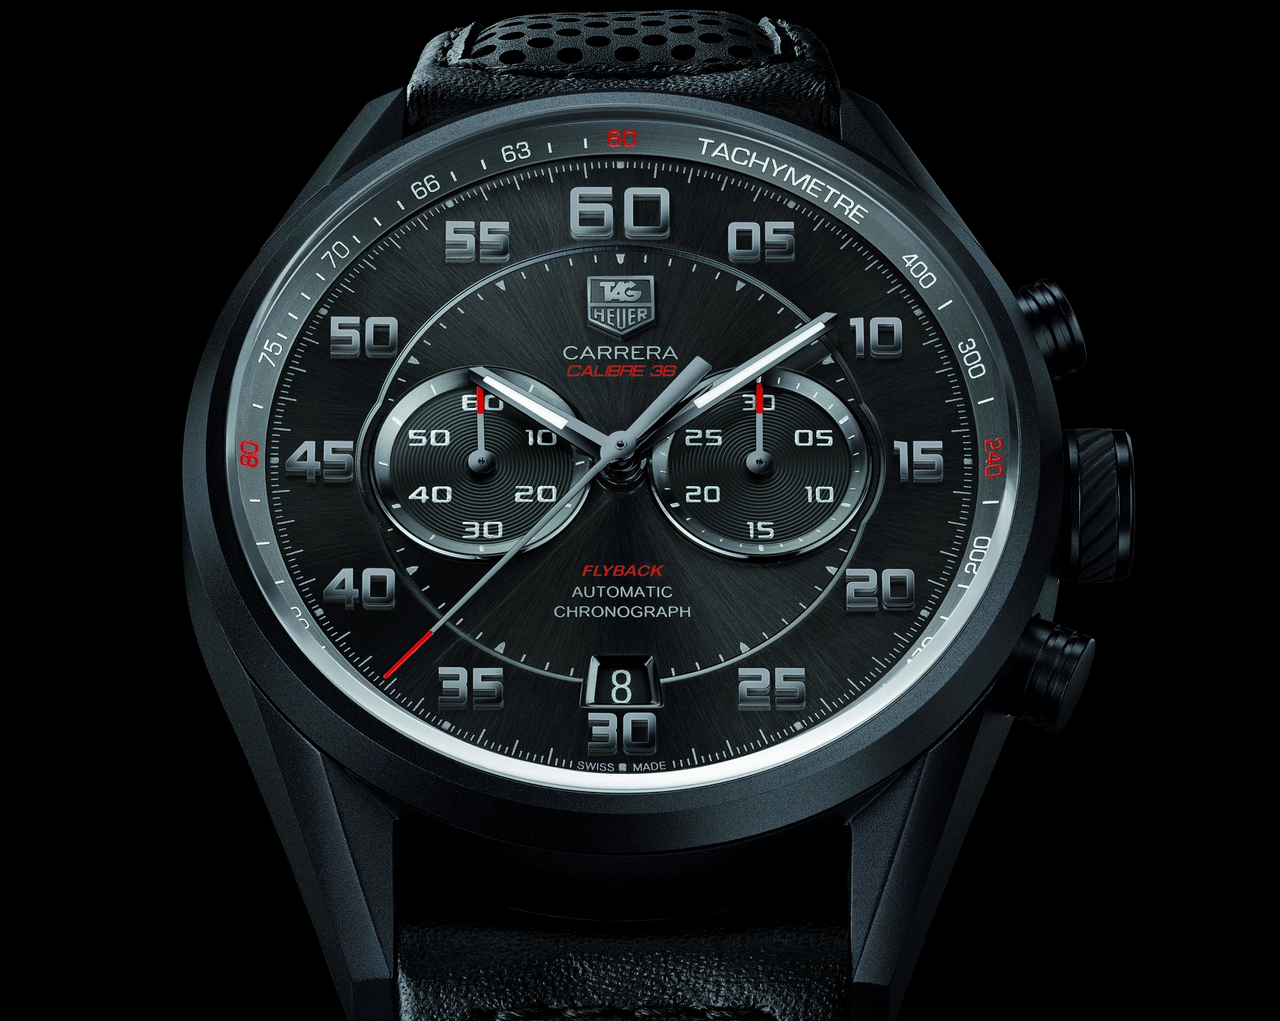 baselworld-2013tag-heuer-carrera-calibre-36-chronograph-flyback-racing_0-100_1